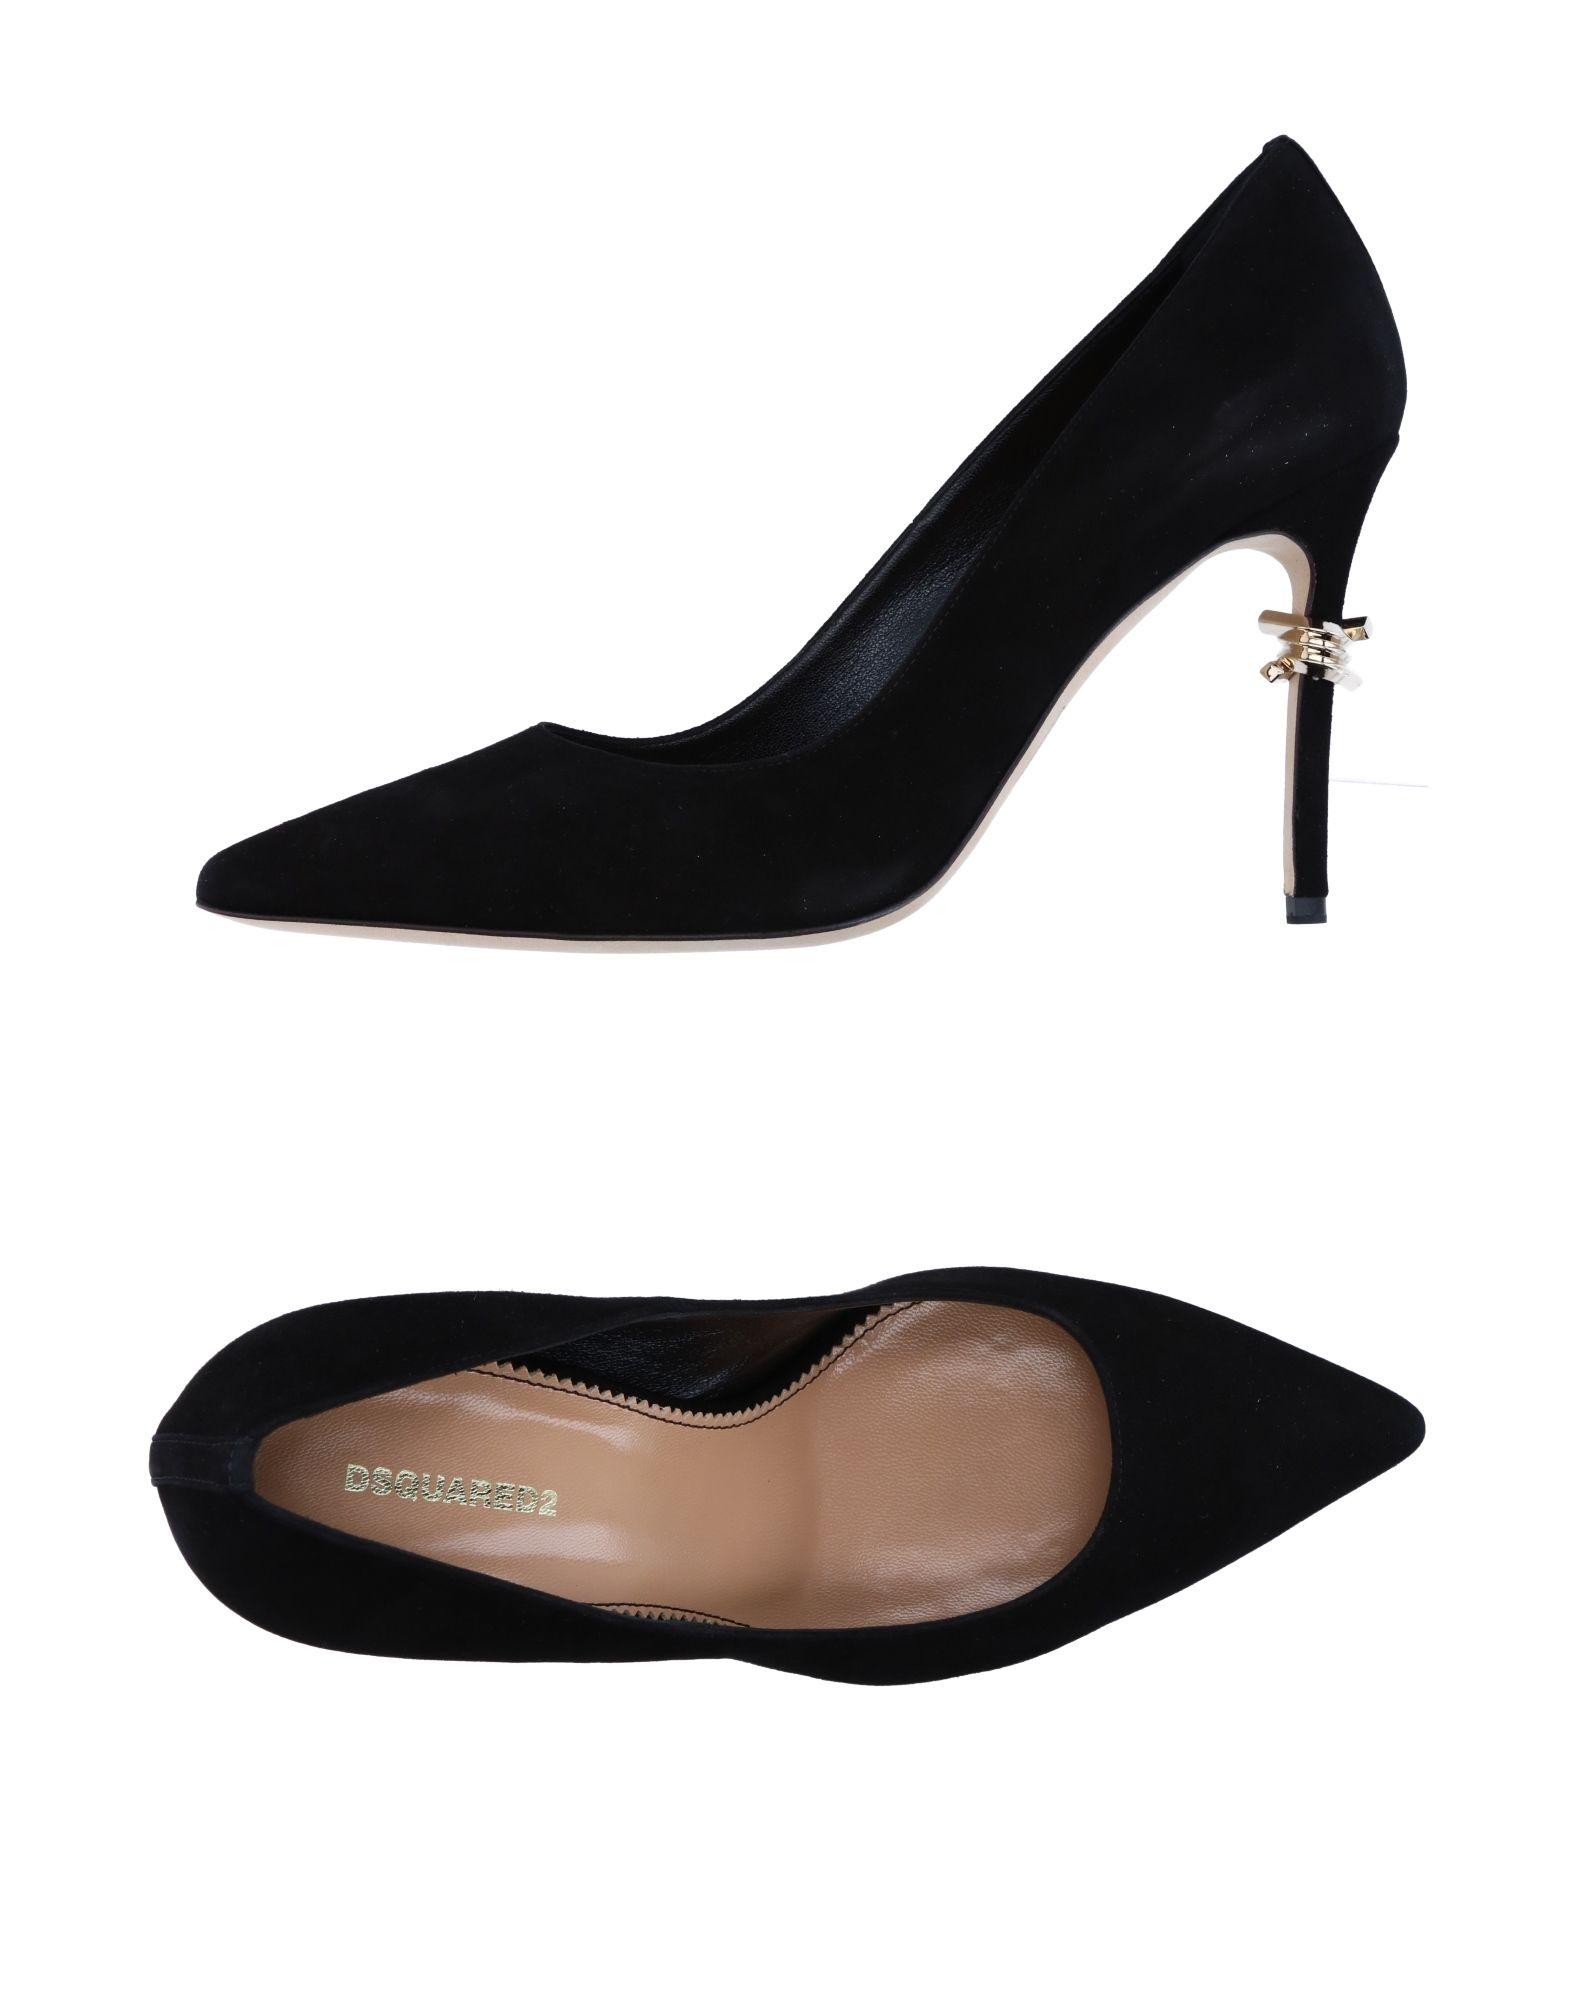 Dsquared2 Pumps aussehende Damen  11263765FMGünstige gut aussehende Pumps Schuhe 2a930a